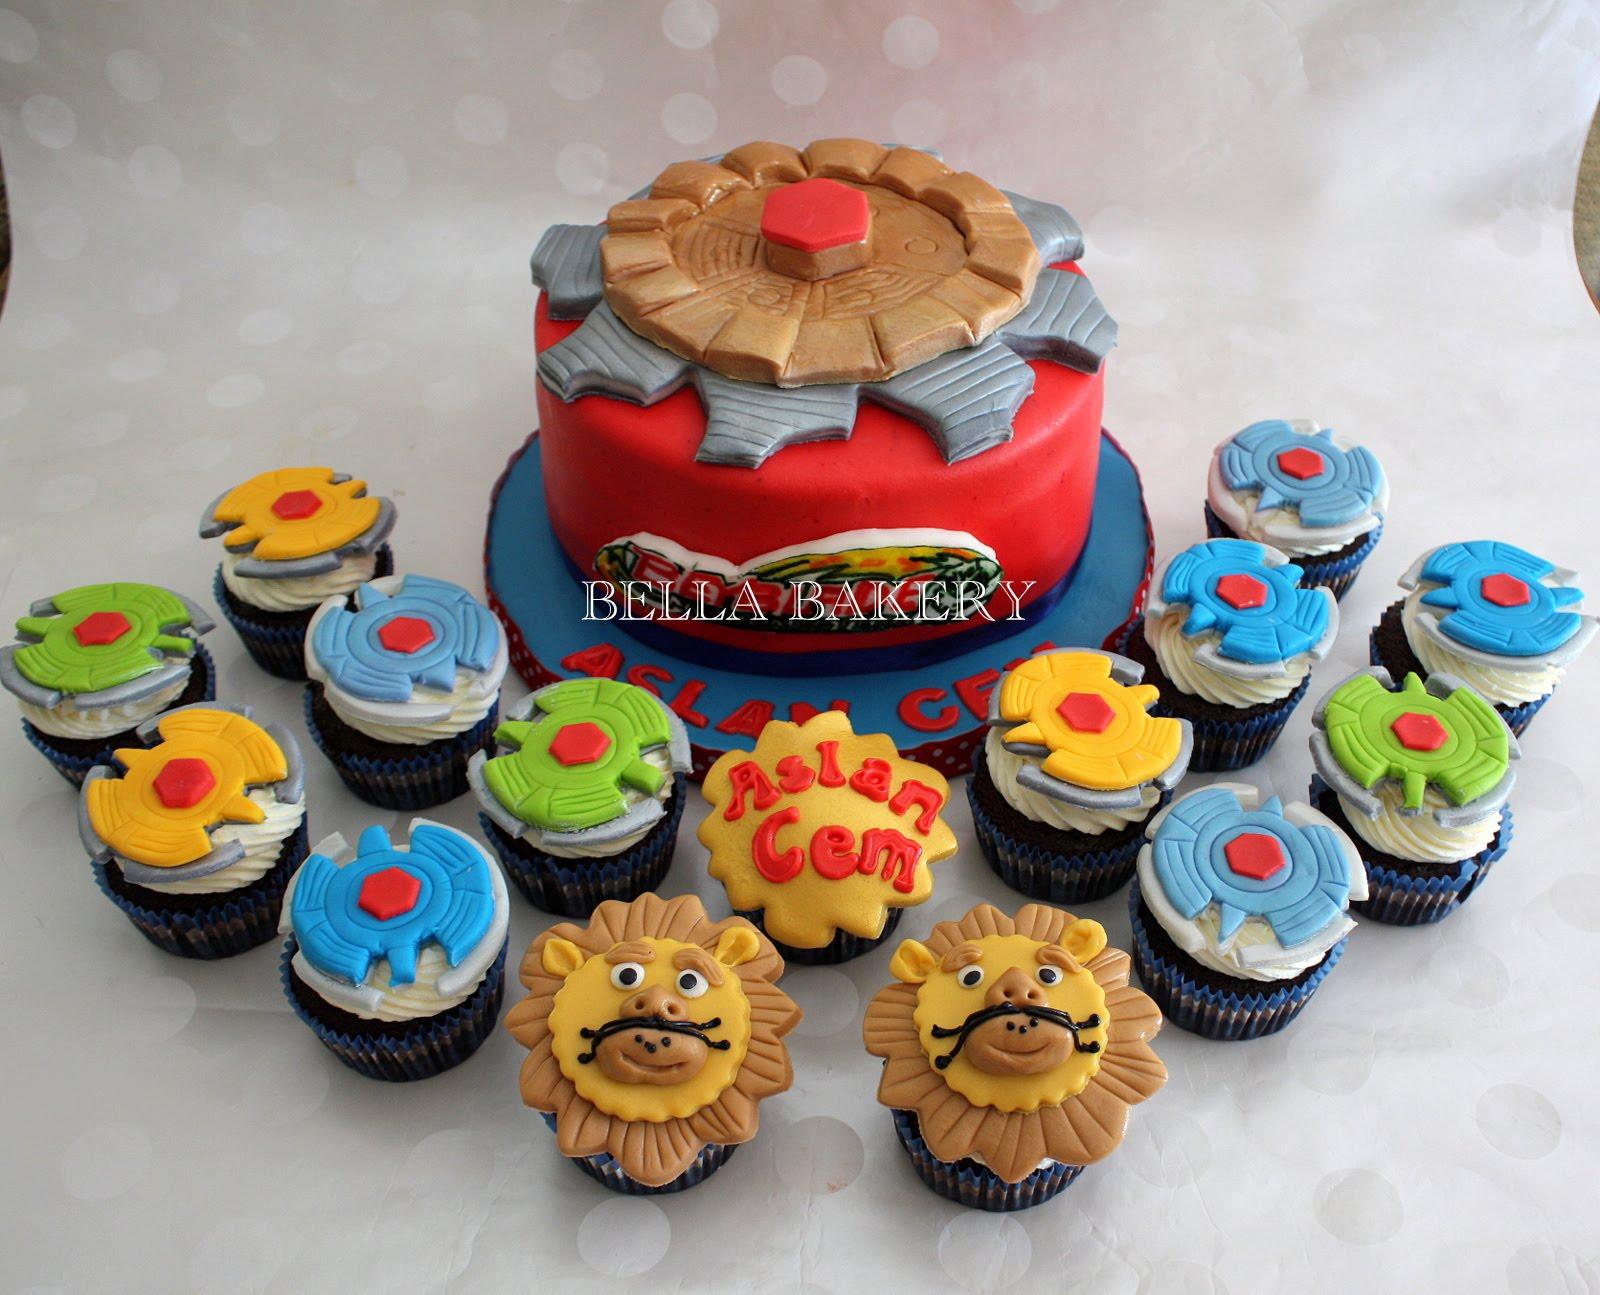 BEYBLADE CAKE & CUPCAKES